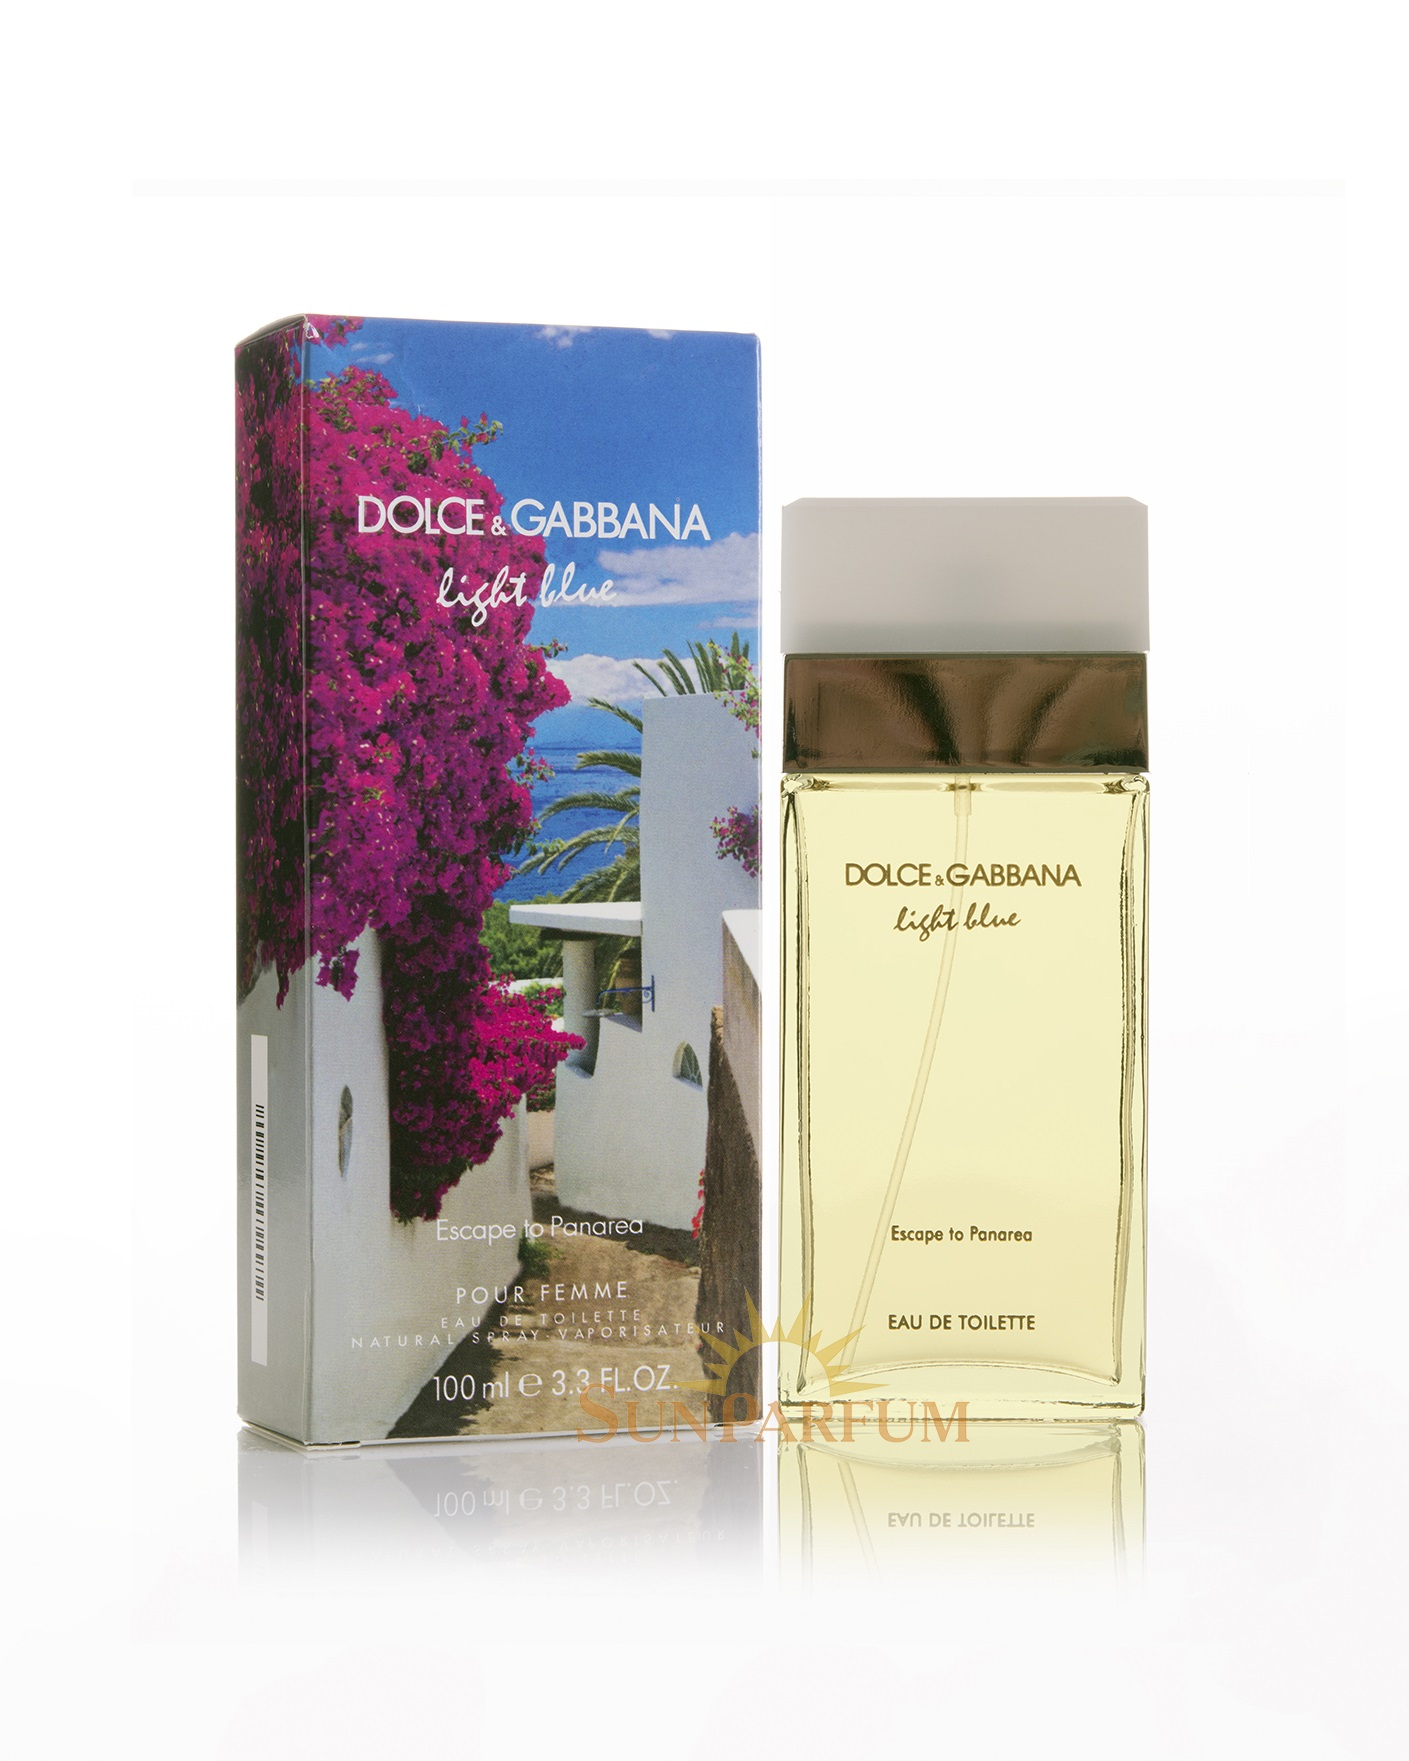 купить духи Dolce Gabbana Light Blue Escape To Panarea 100 мл в